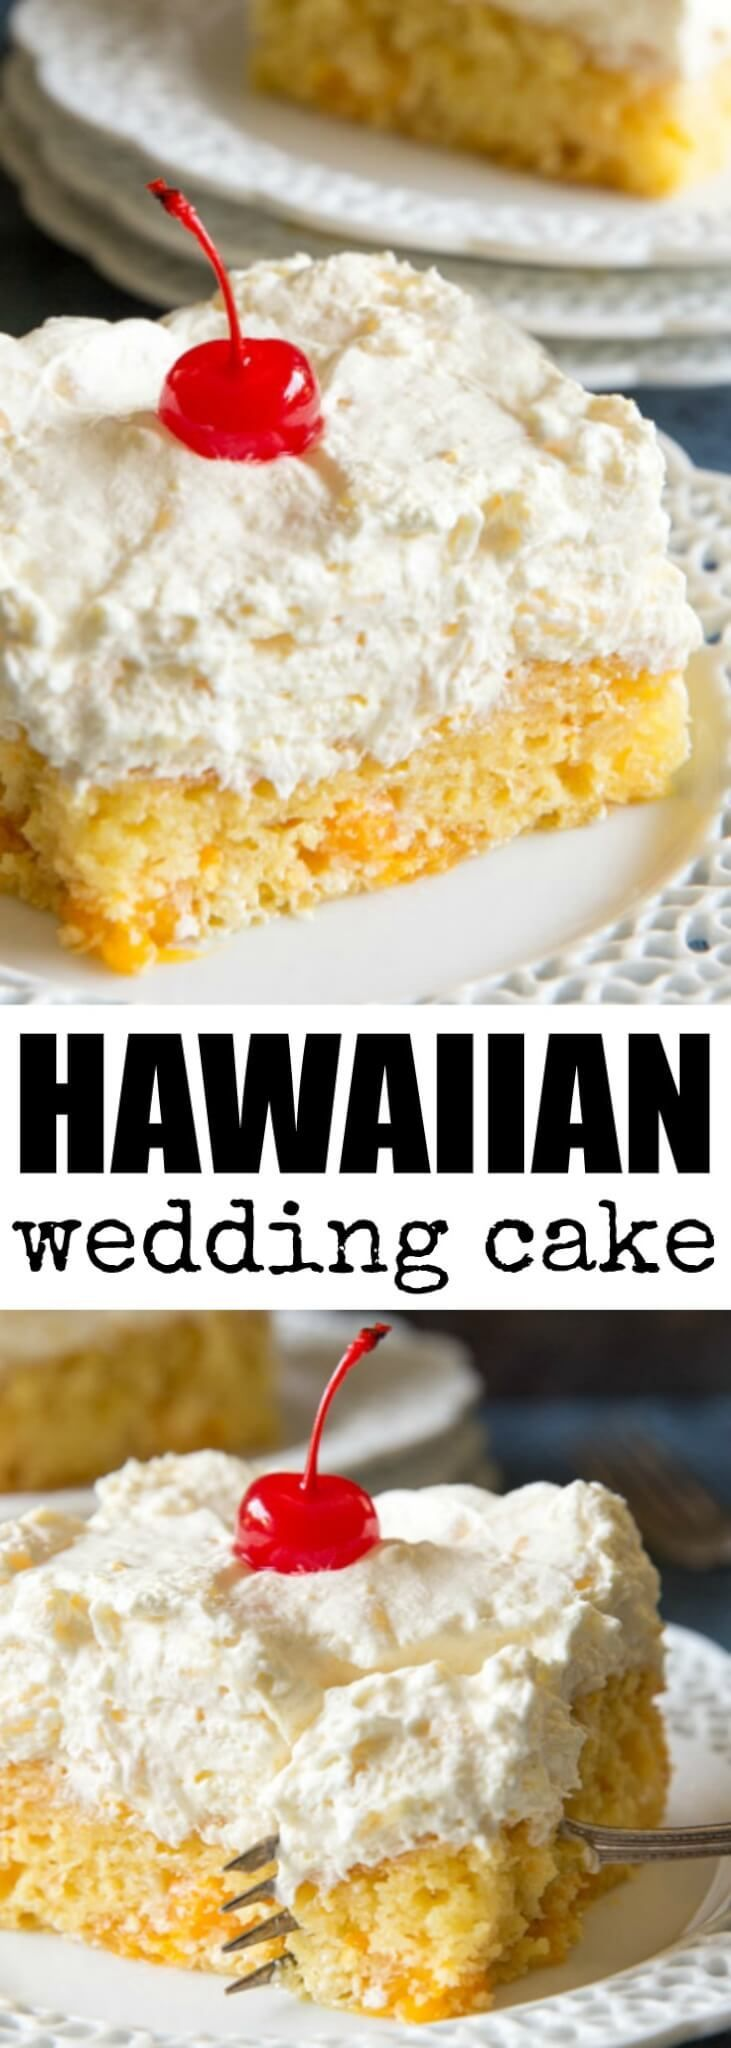 Hawaiian Wedding Cake has oranges in the batter, p…